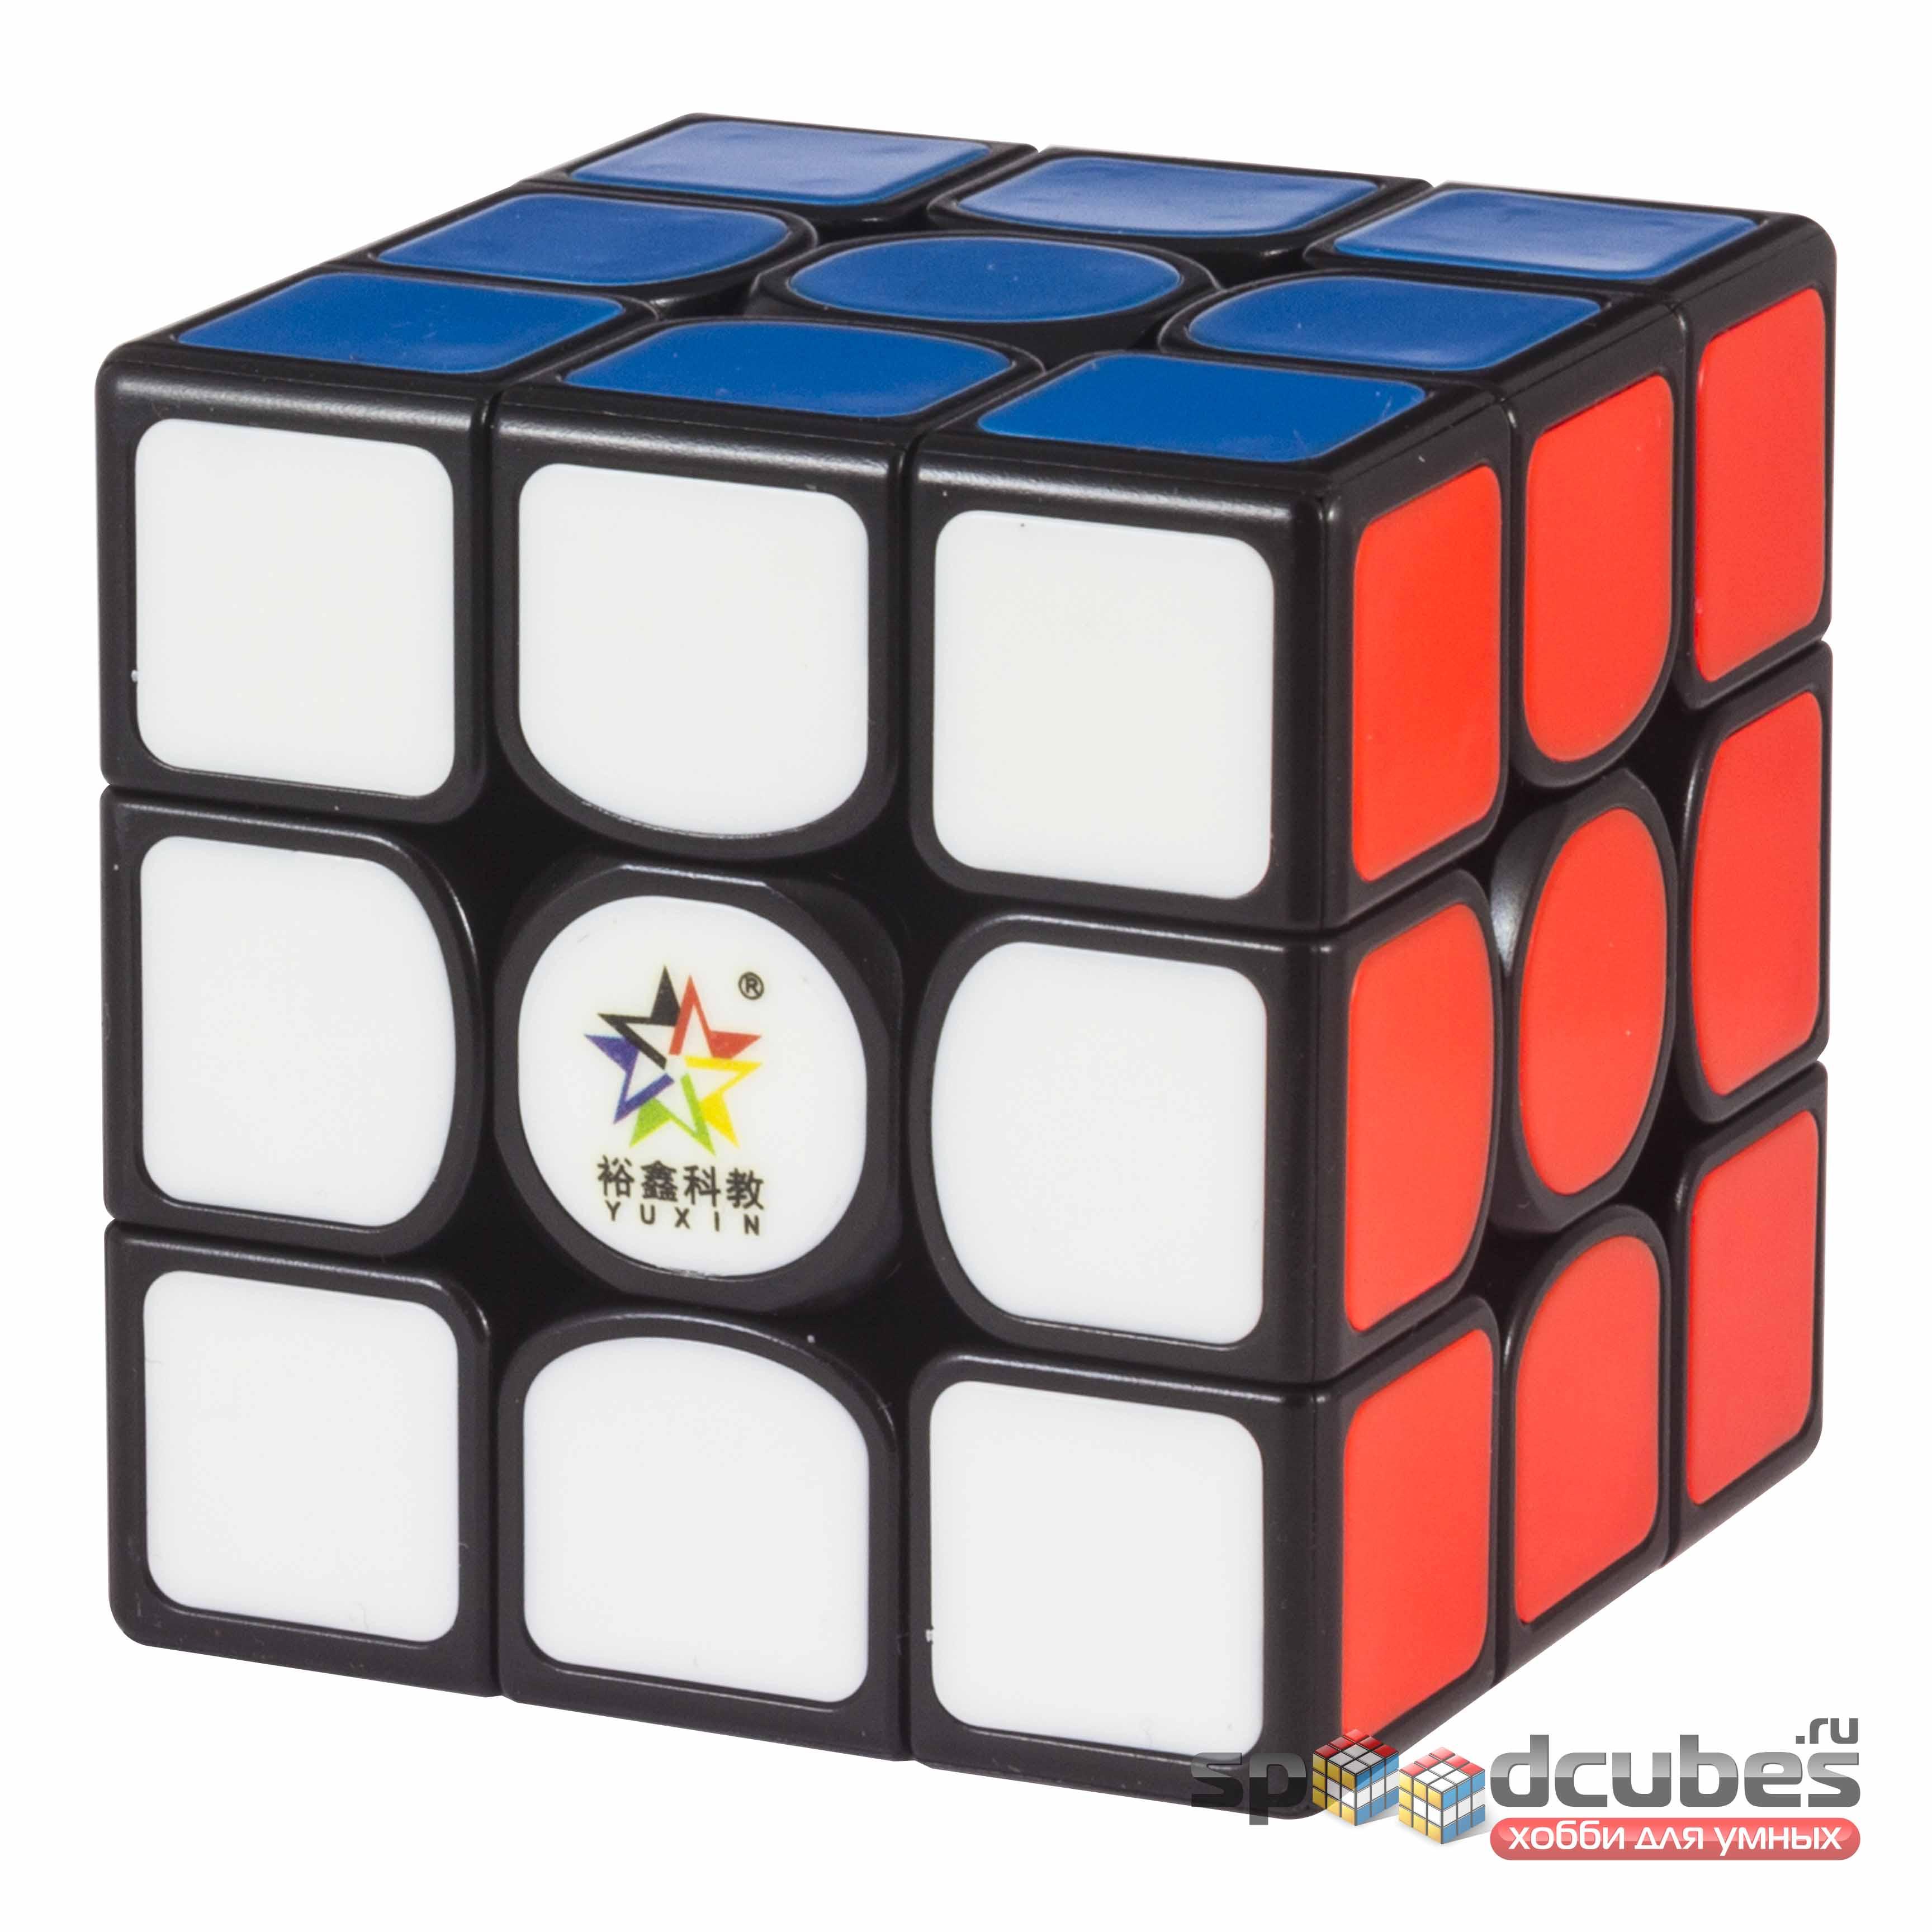 Yuxin 3x3x3 Kylin V2 M